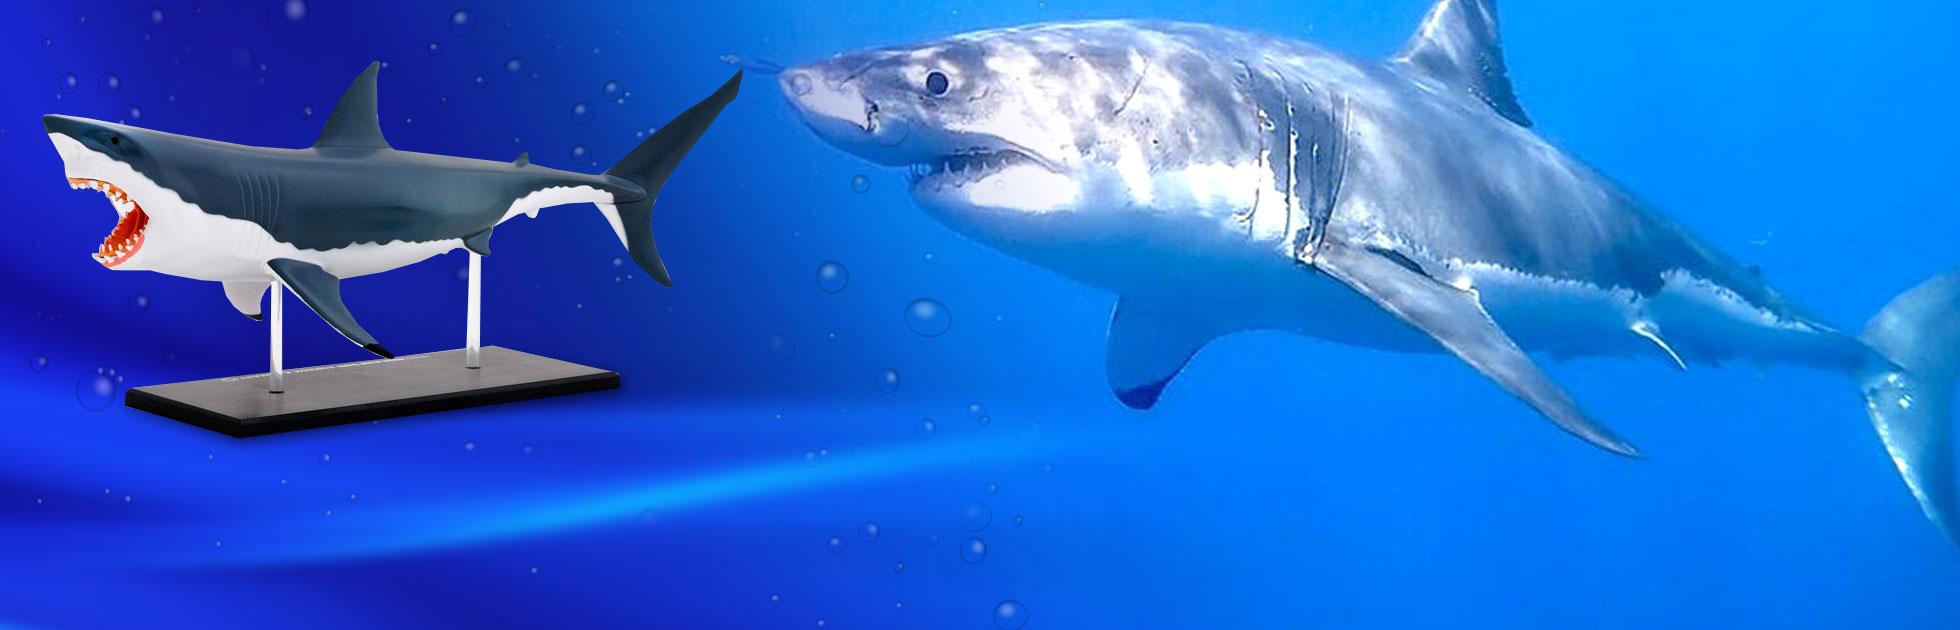 shark-background2